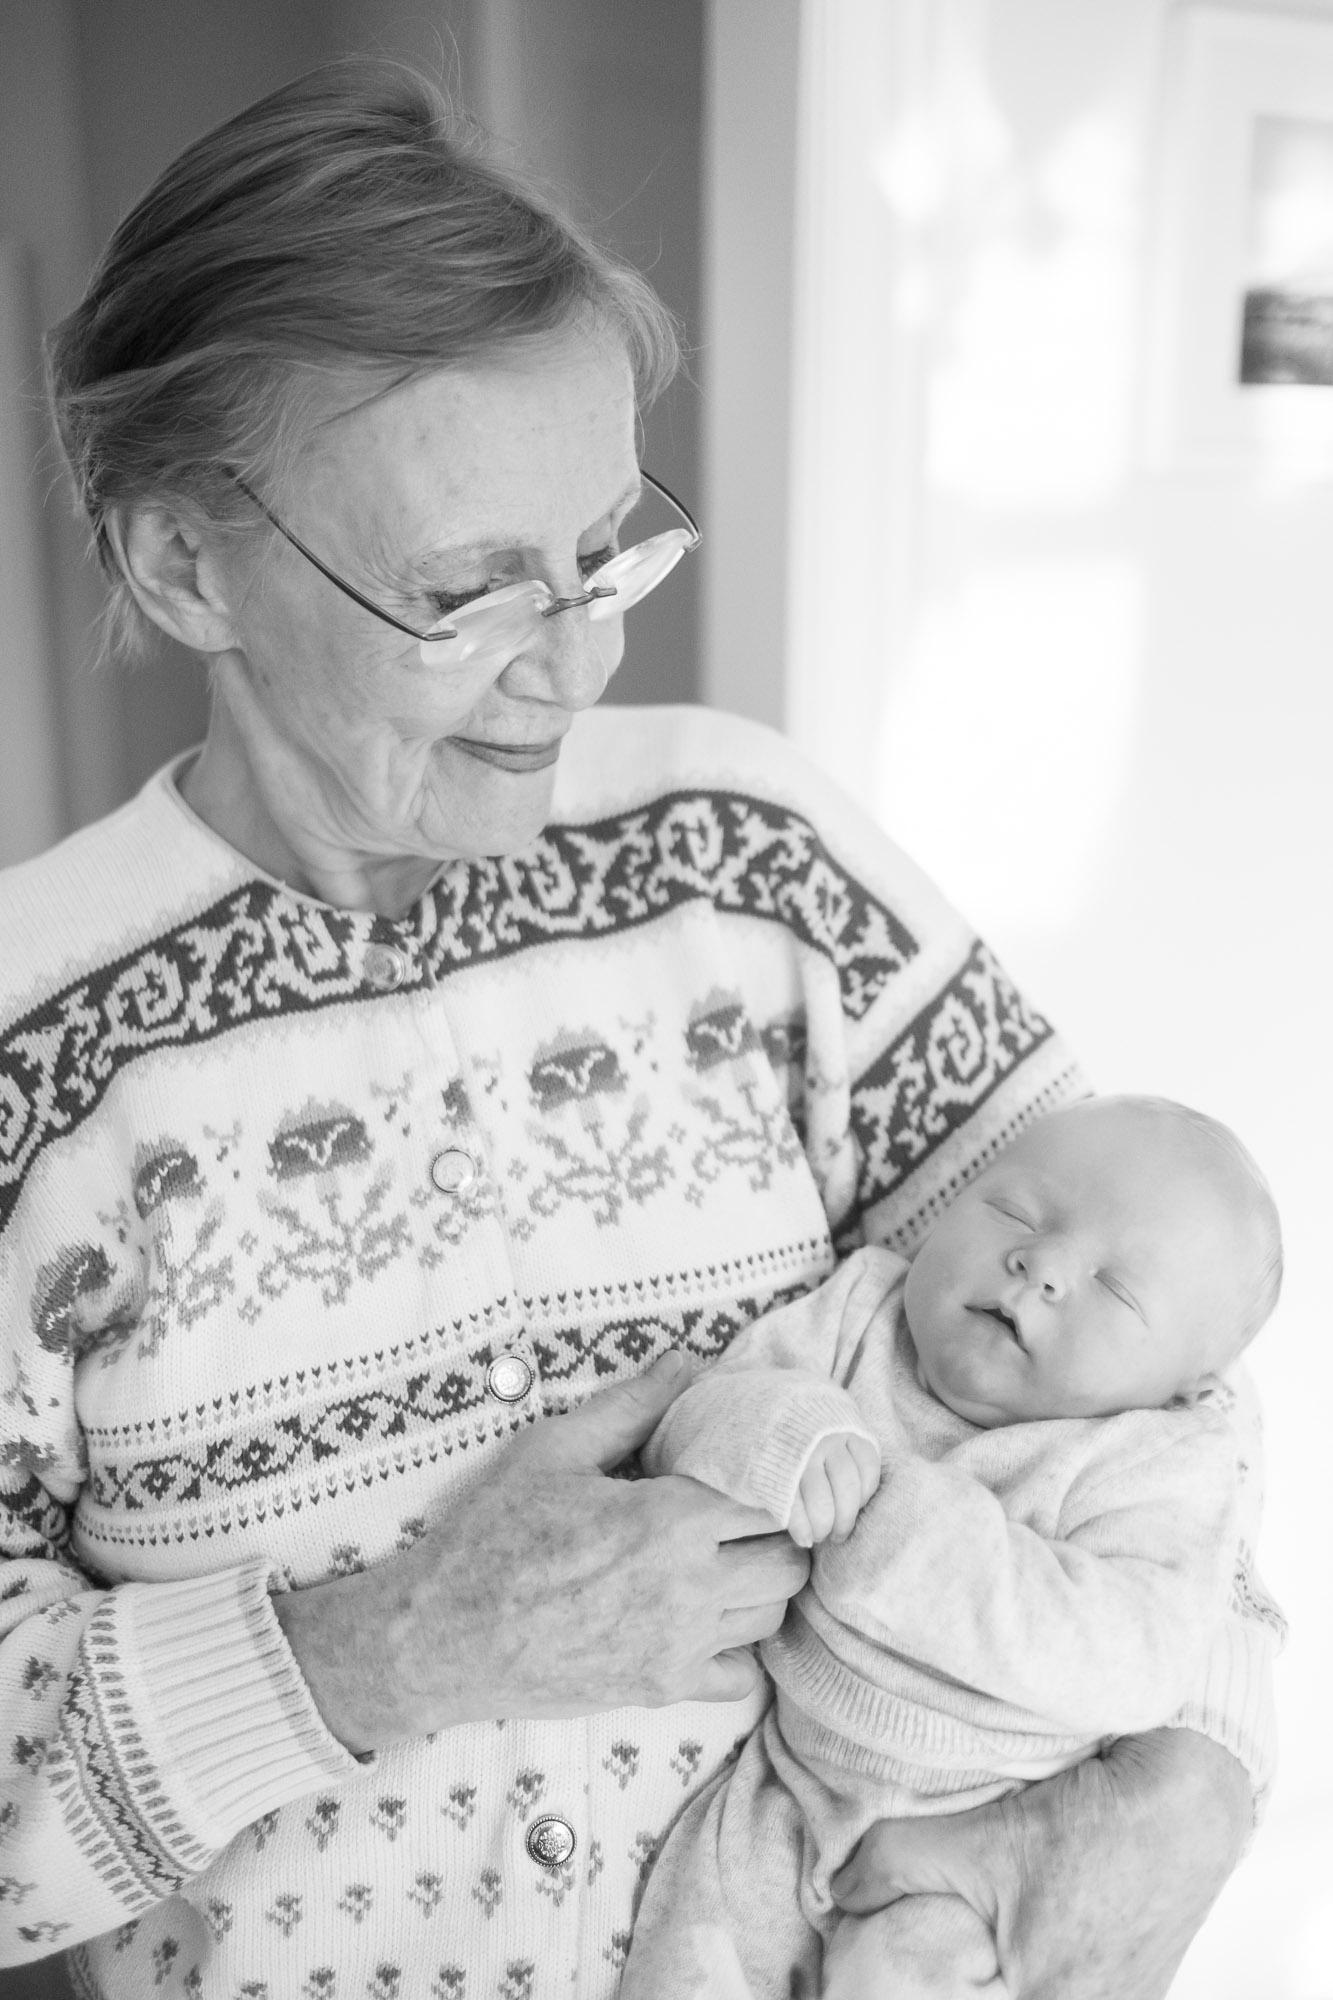 newborn-baby-family-portrait-photographer-097.jpg